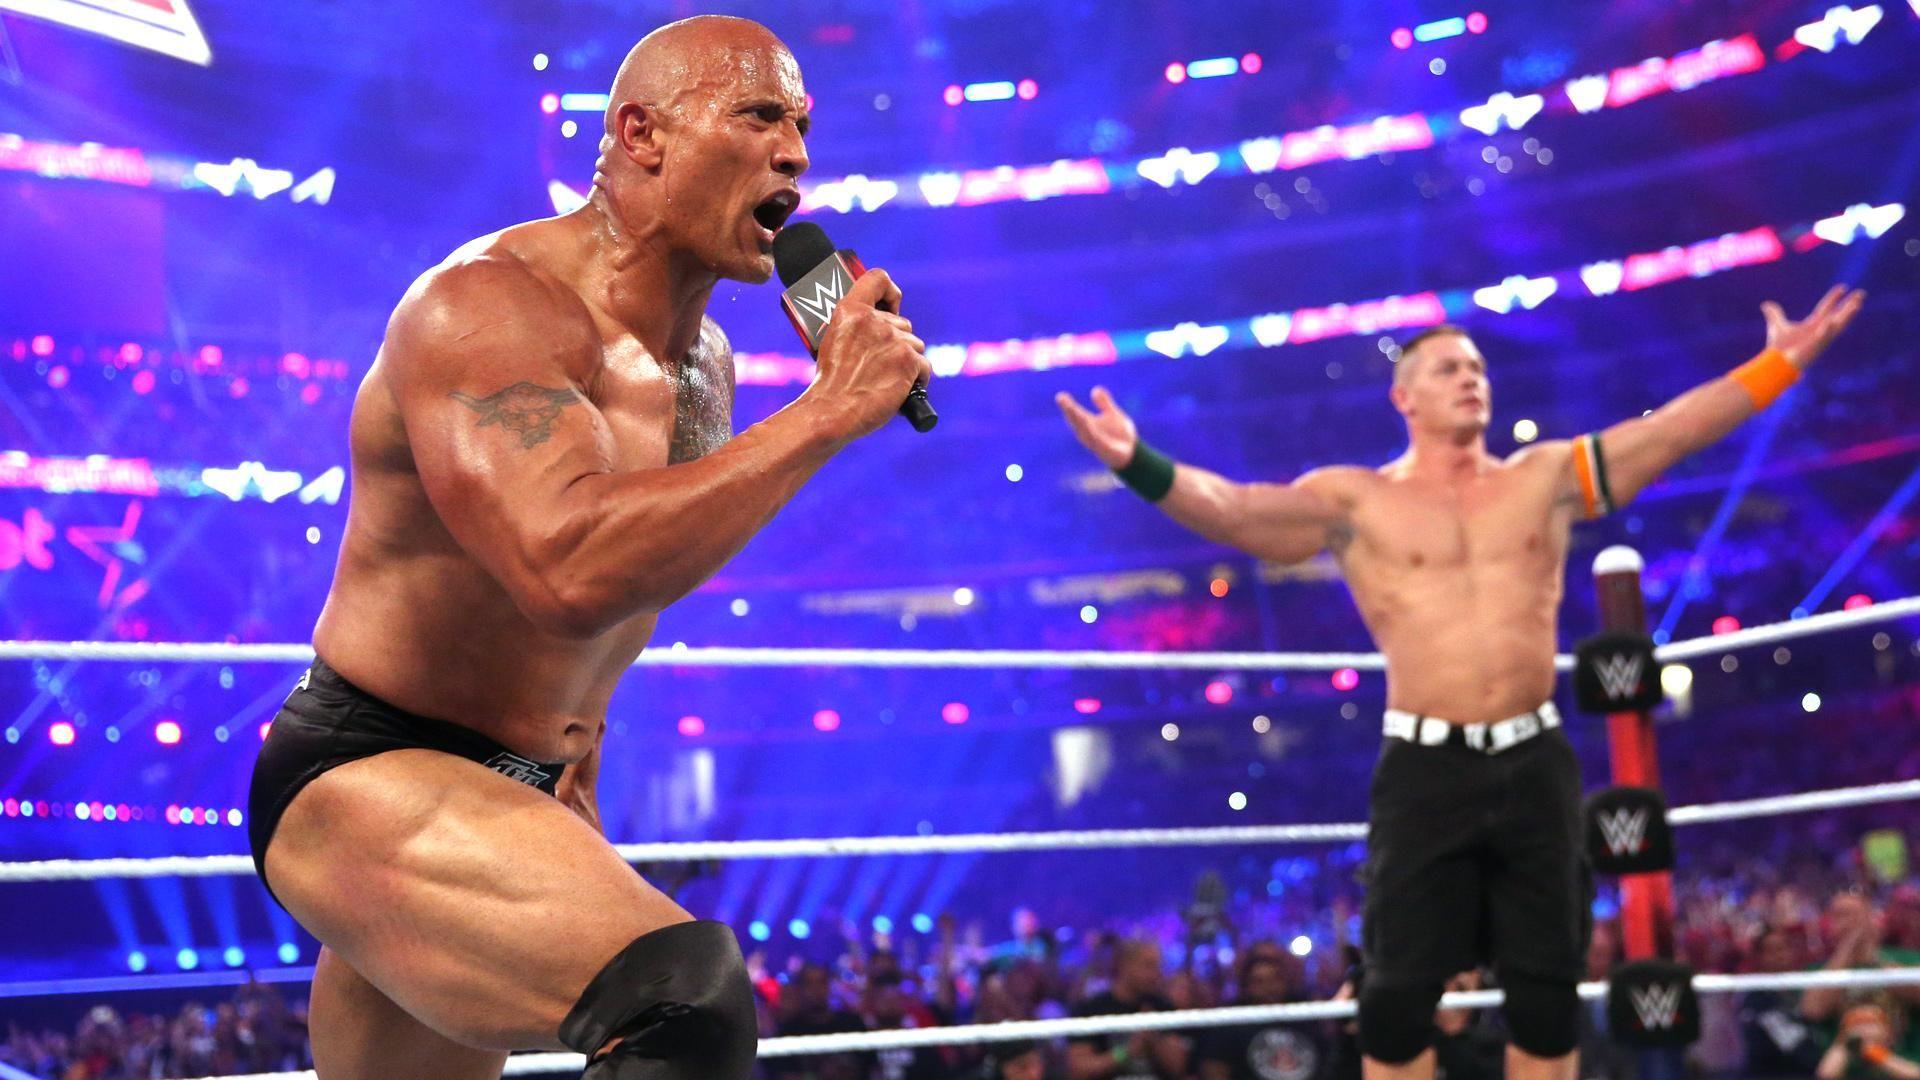 The Rock and John Cena at WrestleMania 32